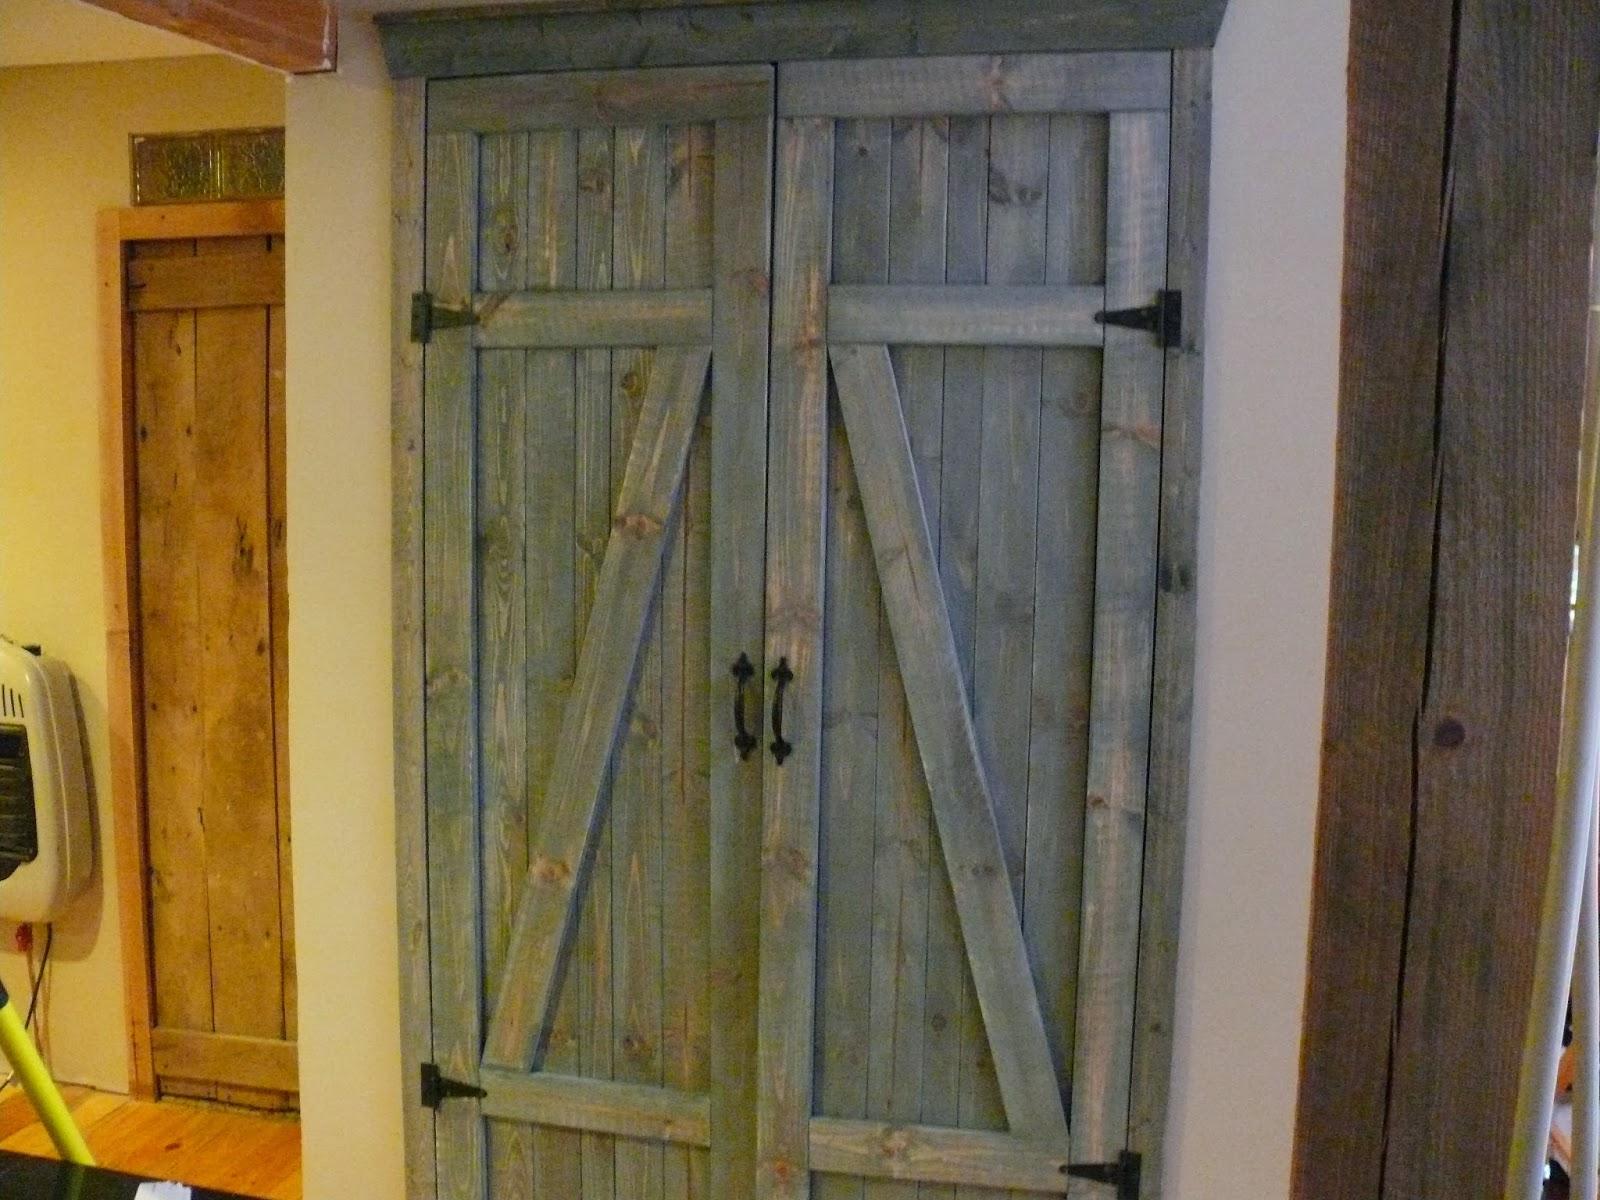 Closet Barn Doordiy Closet Door Ideas Closet Barn Doors & Makeshift Doors - Sanfranciscolife